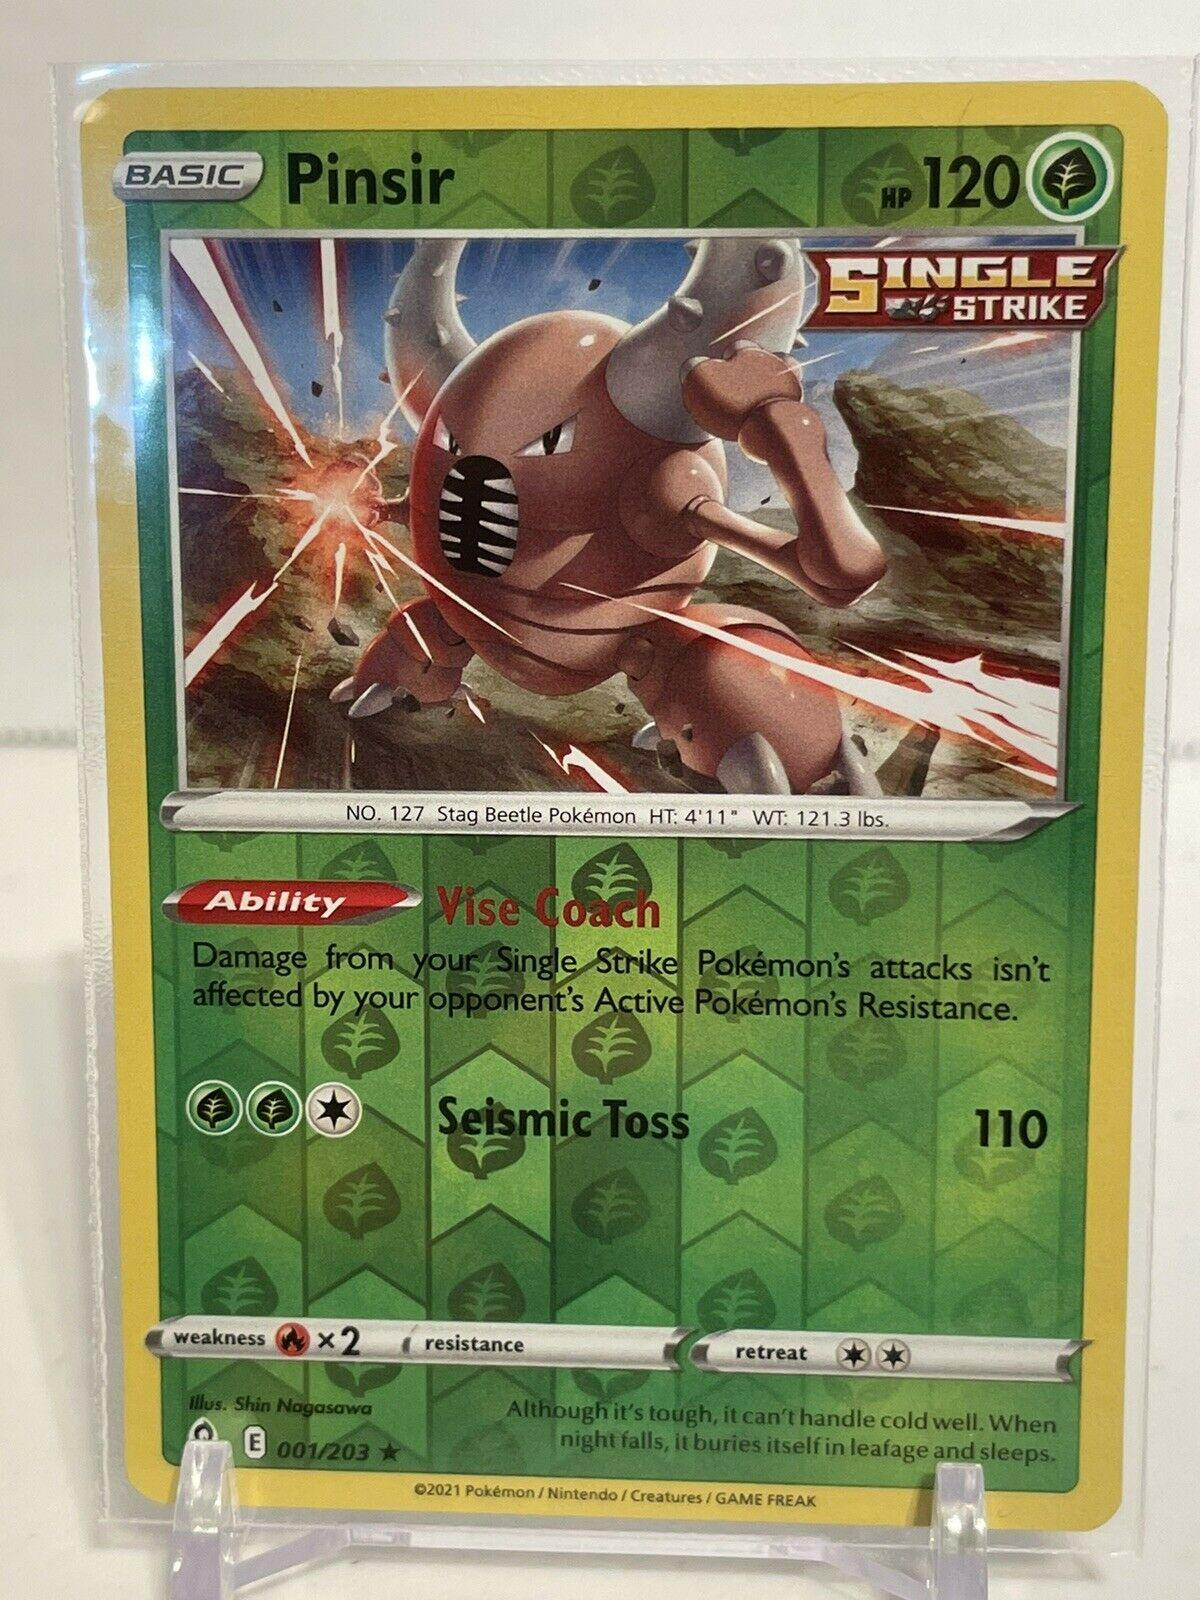 Pokemon PINSIR 001/203 Evolving Skies - RARE Rev Holo - - MINT